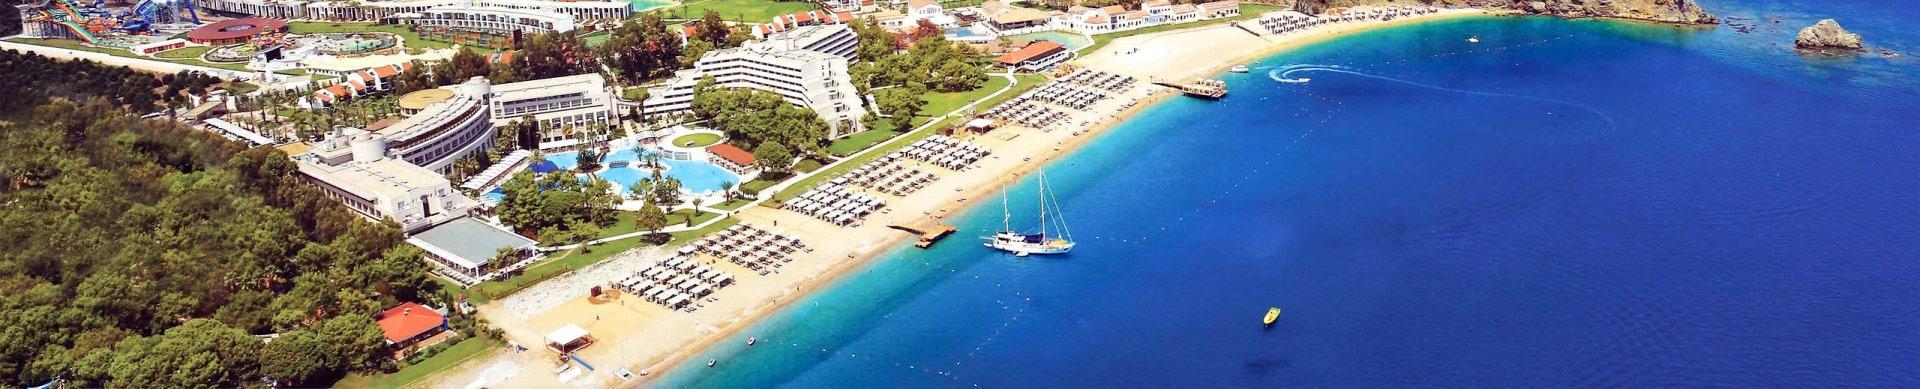 Tekirova transfert aéroport en taxi de / à l'hôtel de vacances transferts aéroport d'Antalya vacances voyage Turquie